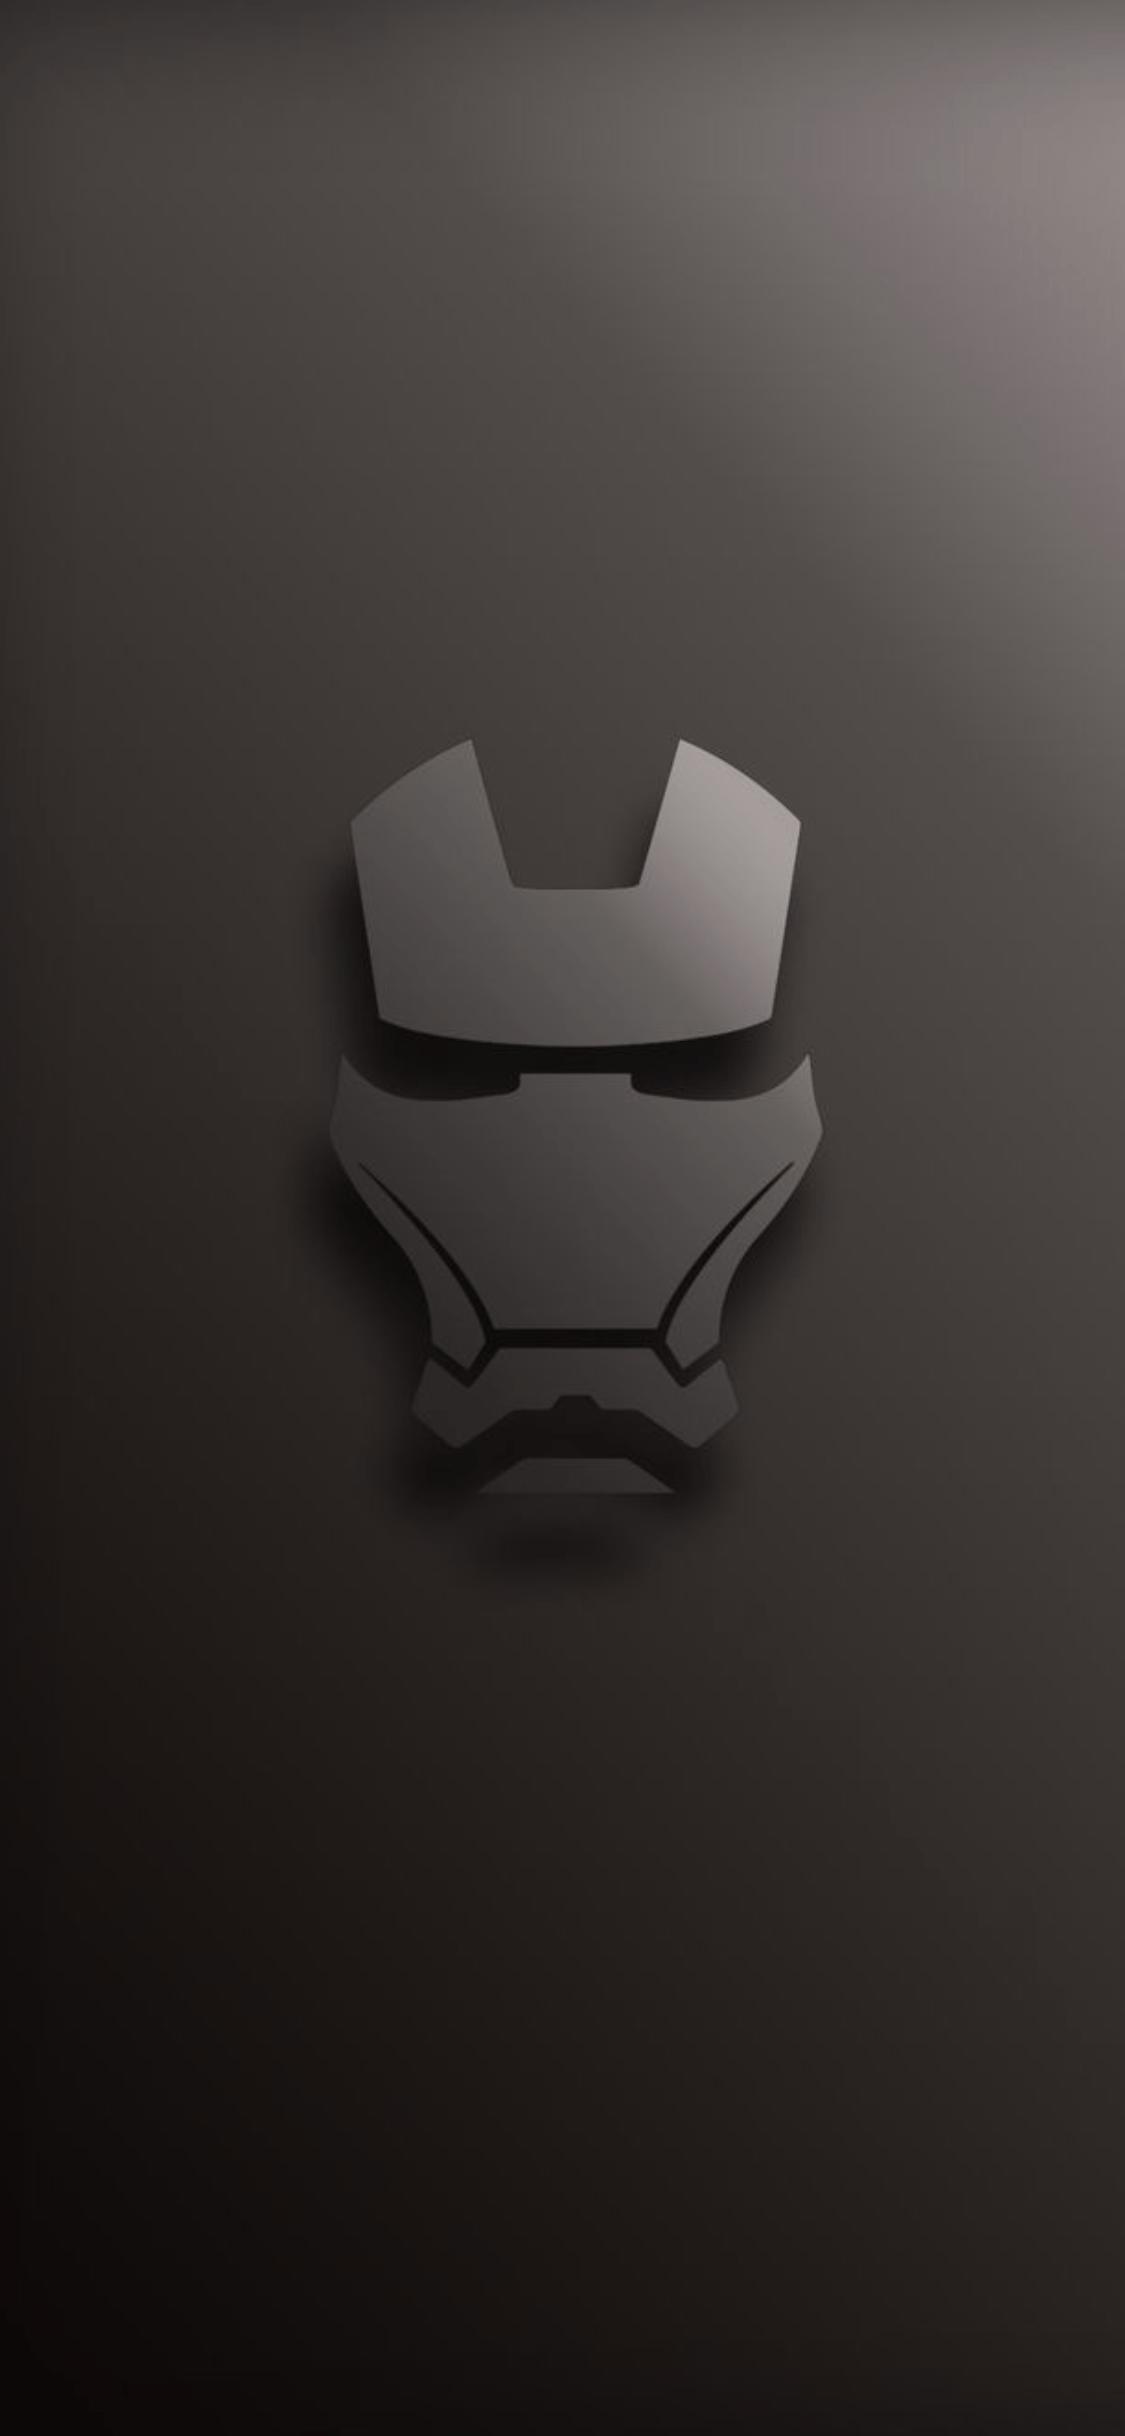 Marvel Logo iPhone Wallpapers - Top